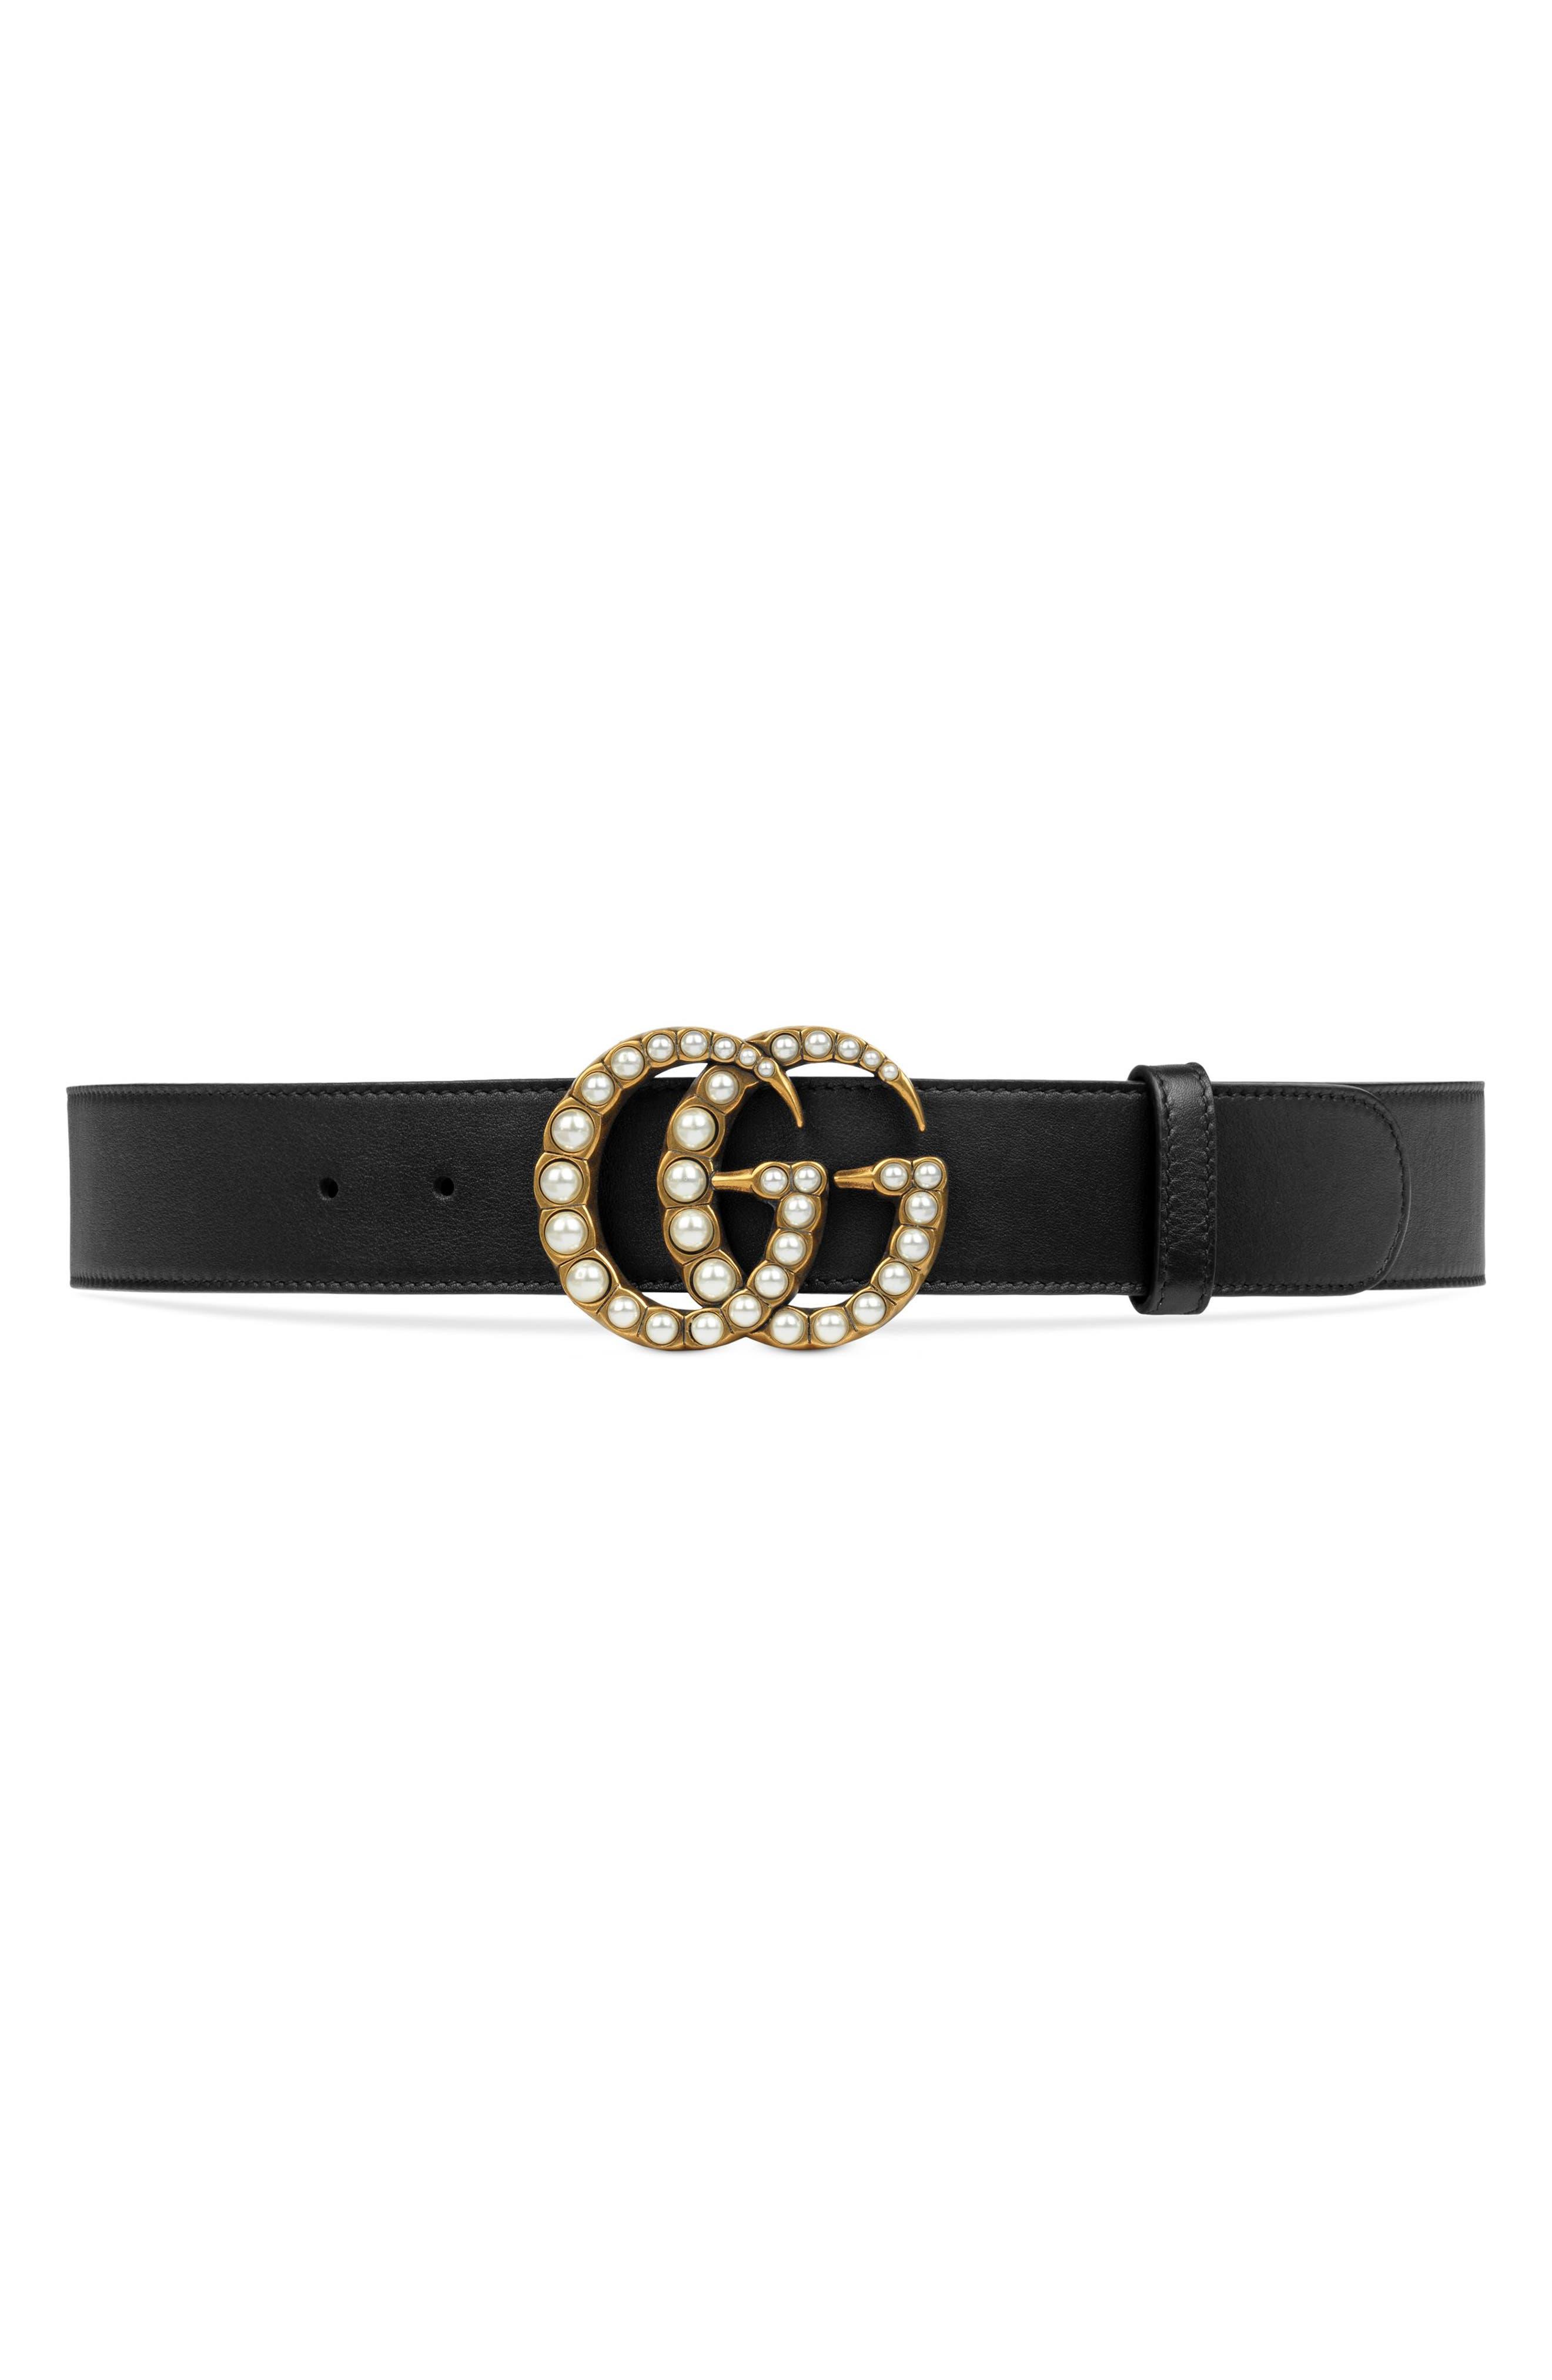 Imitation Pearl Double-G Leather Belt,                         Main,                         color, DLX1T 9094 NERO/CREAM